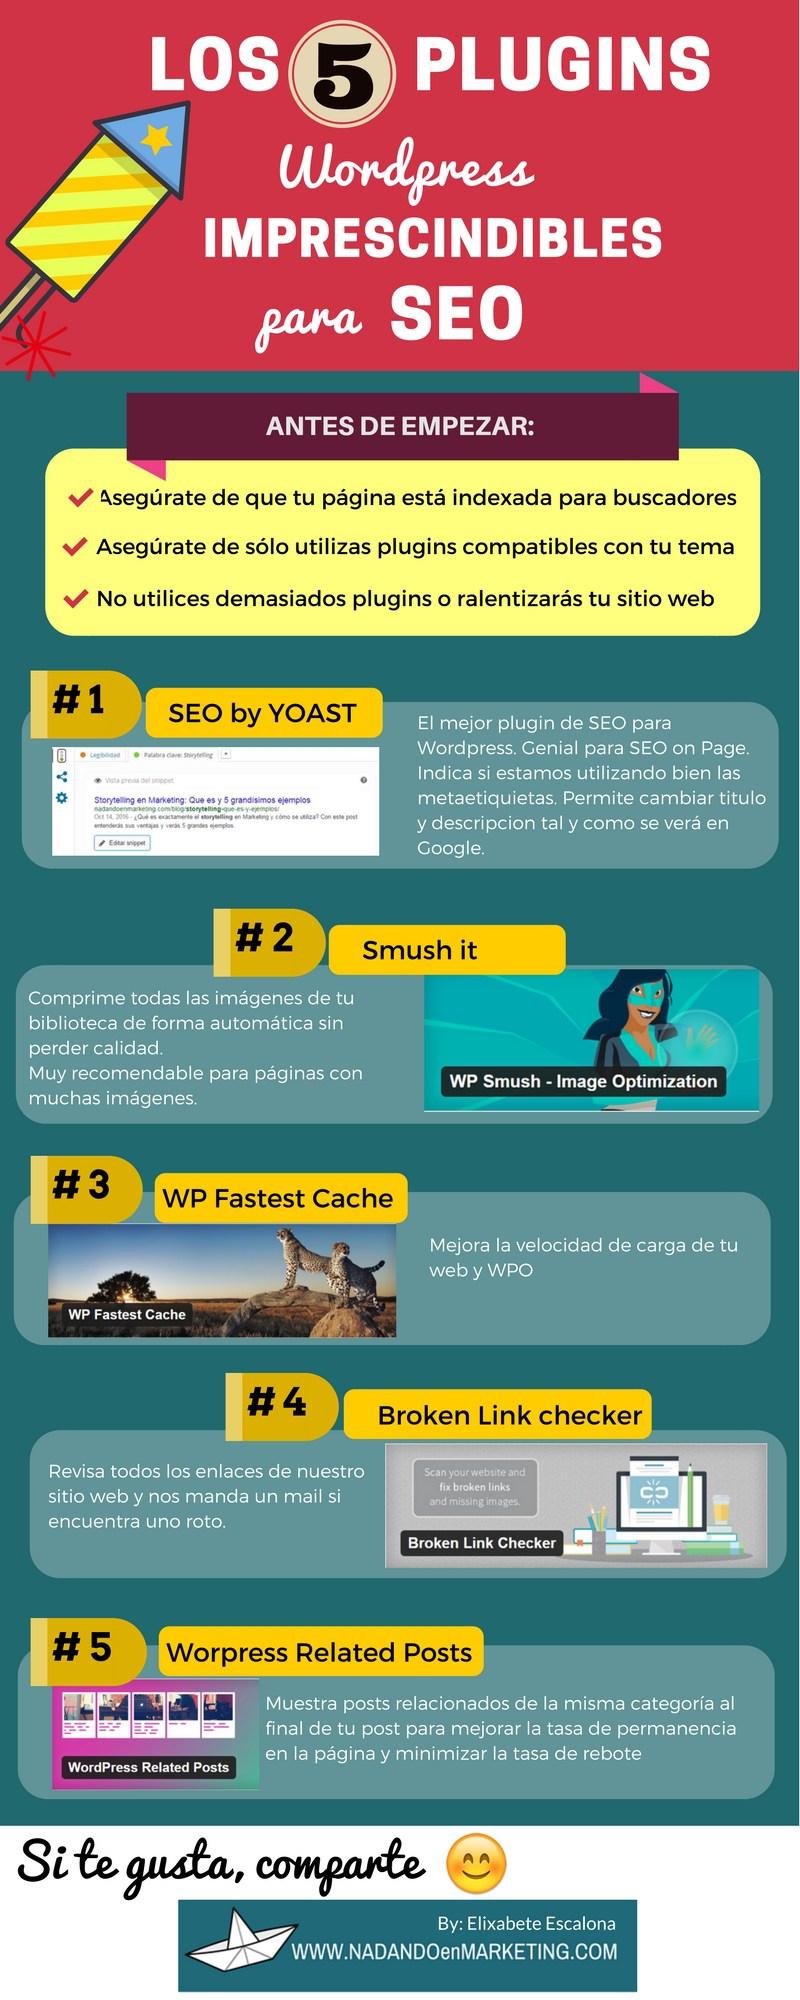 5 plugins de WordPress Imprescindibles para SEO